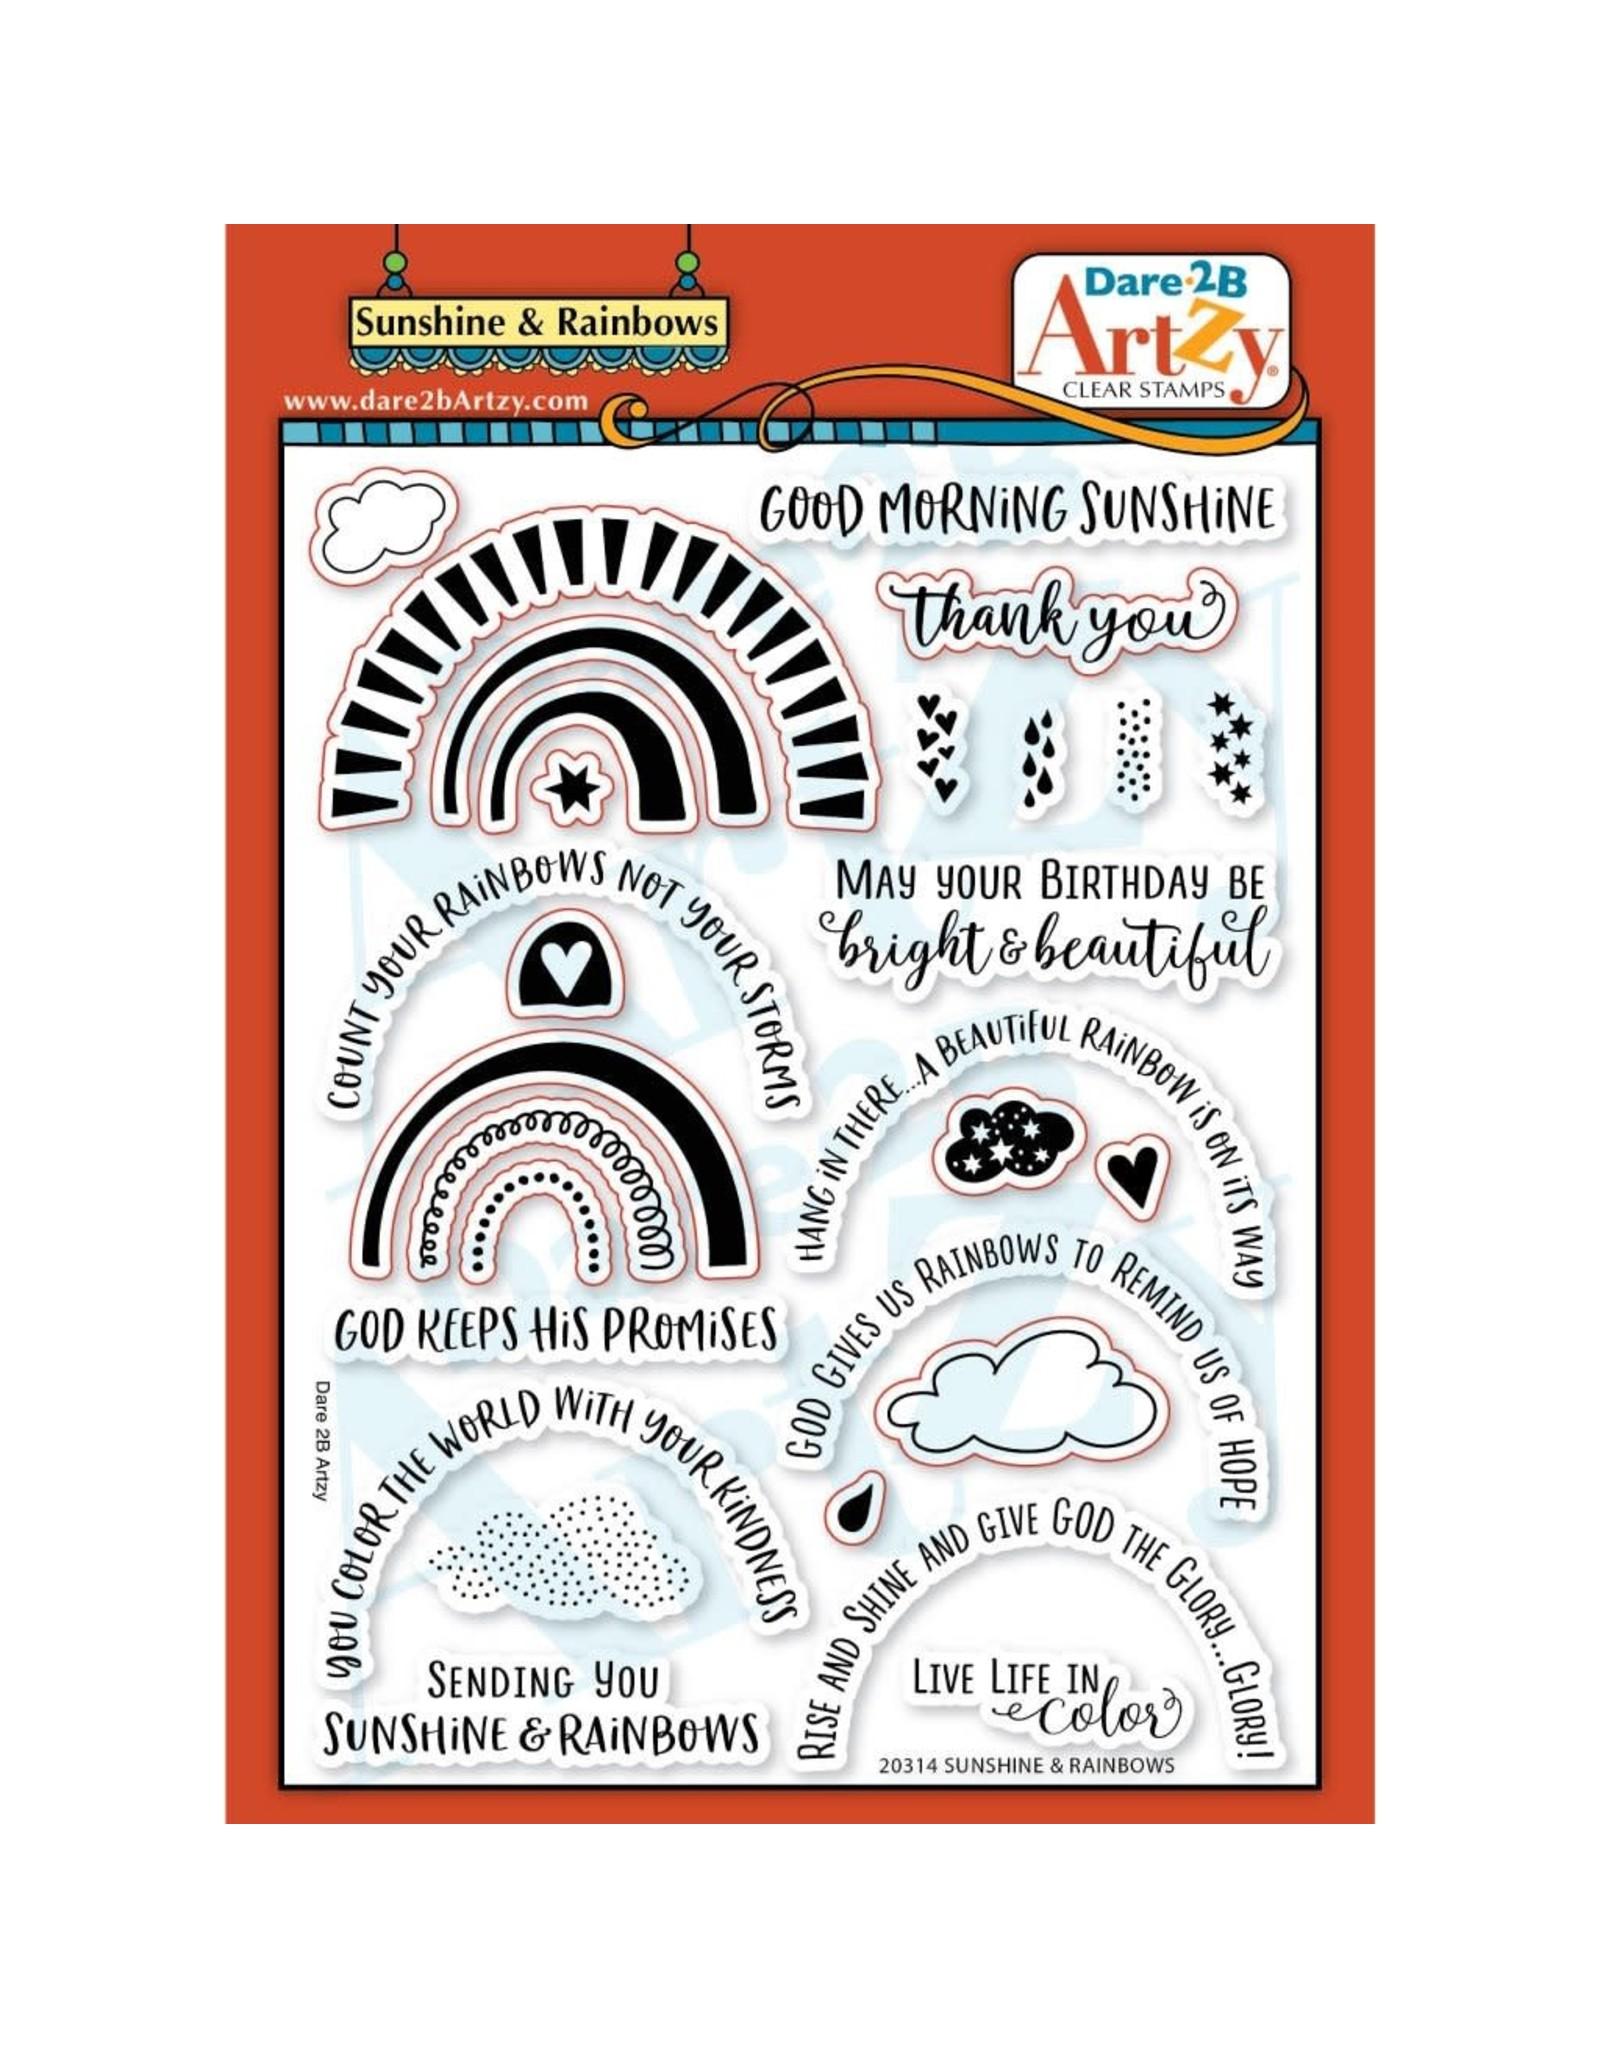 Dare 2B Artzy Sunshine & Rainbows - Clear Stamp Set